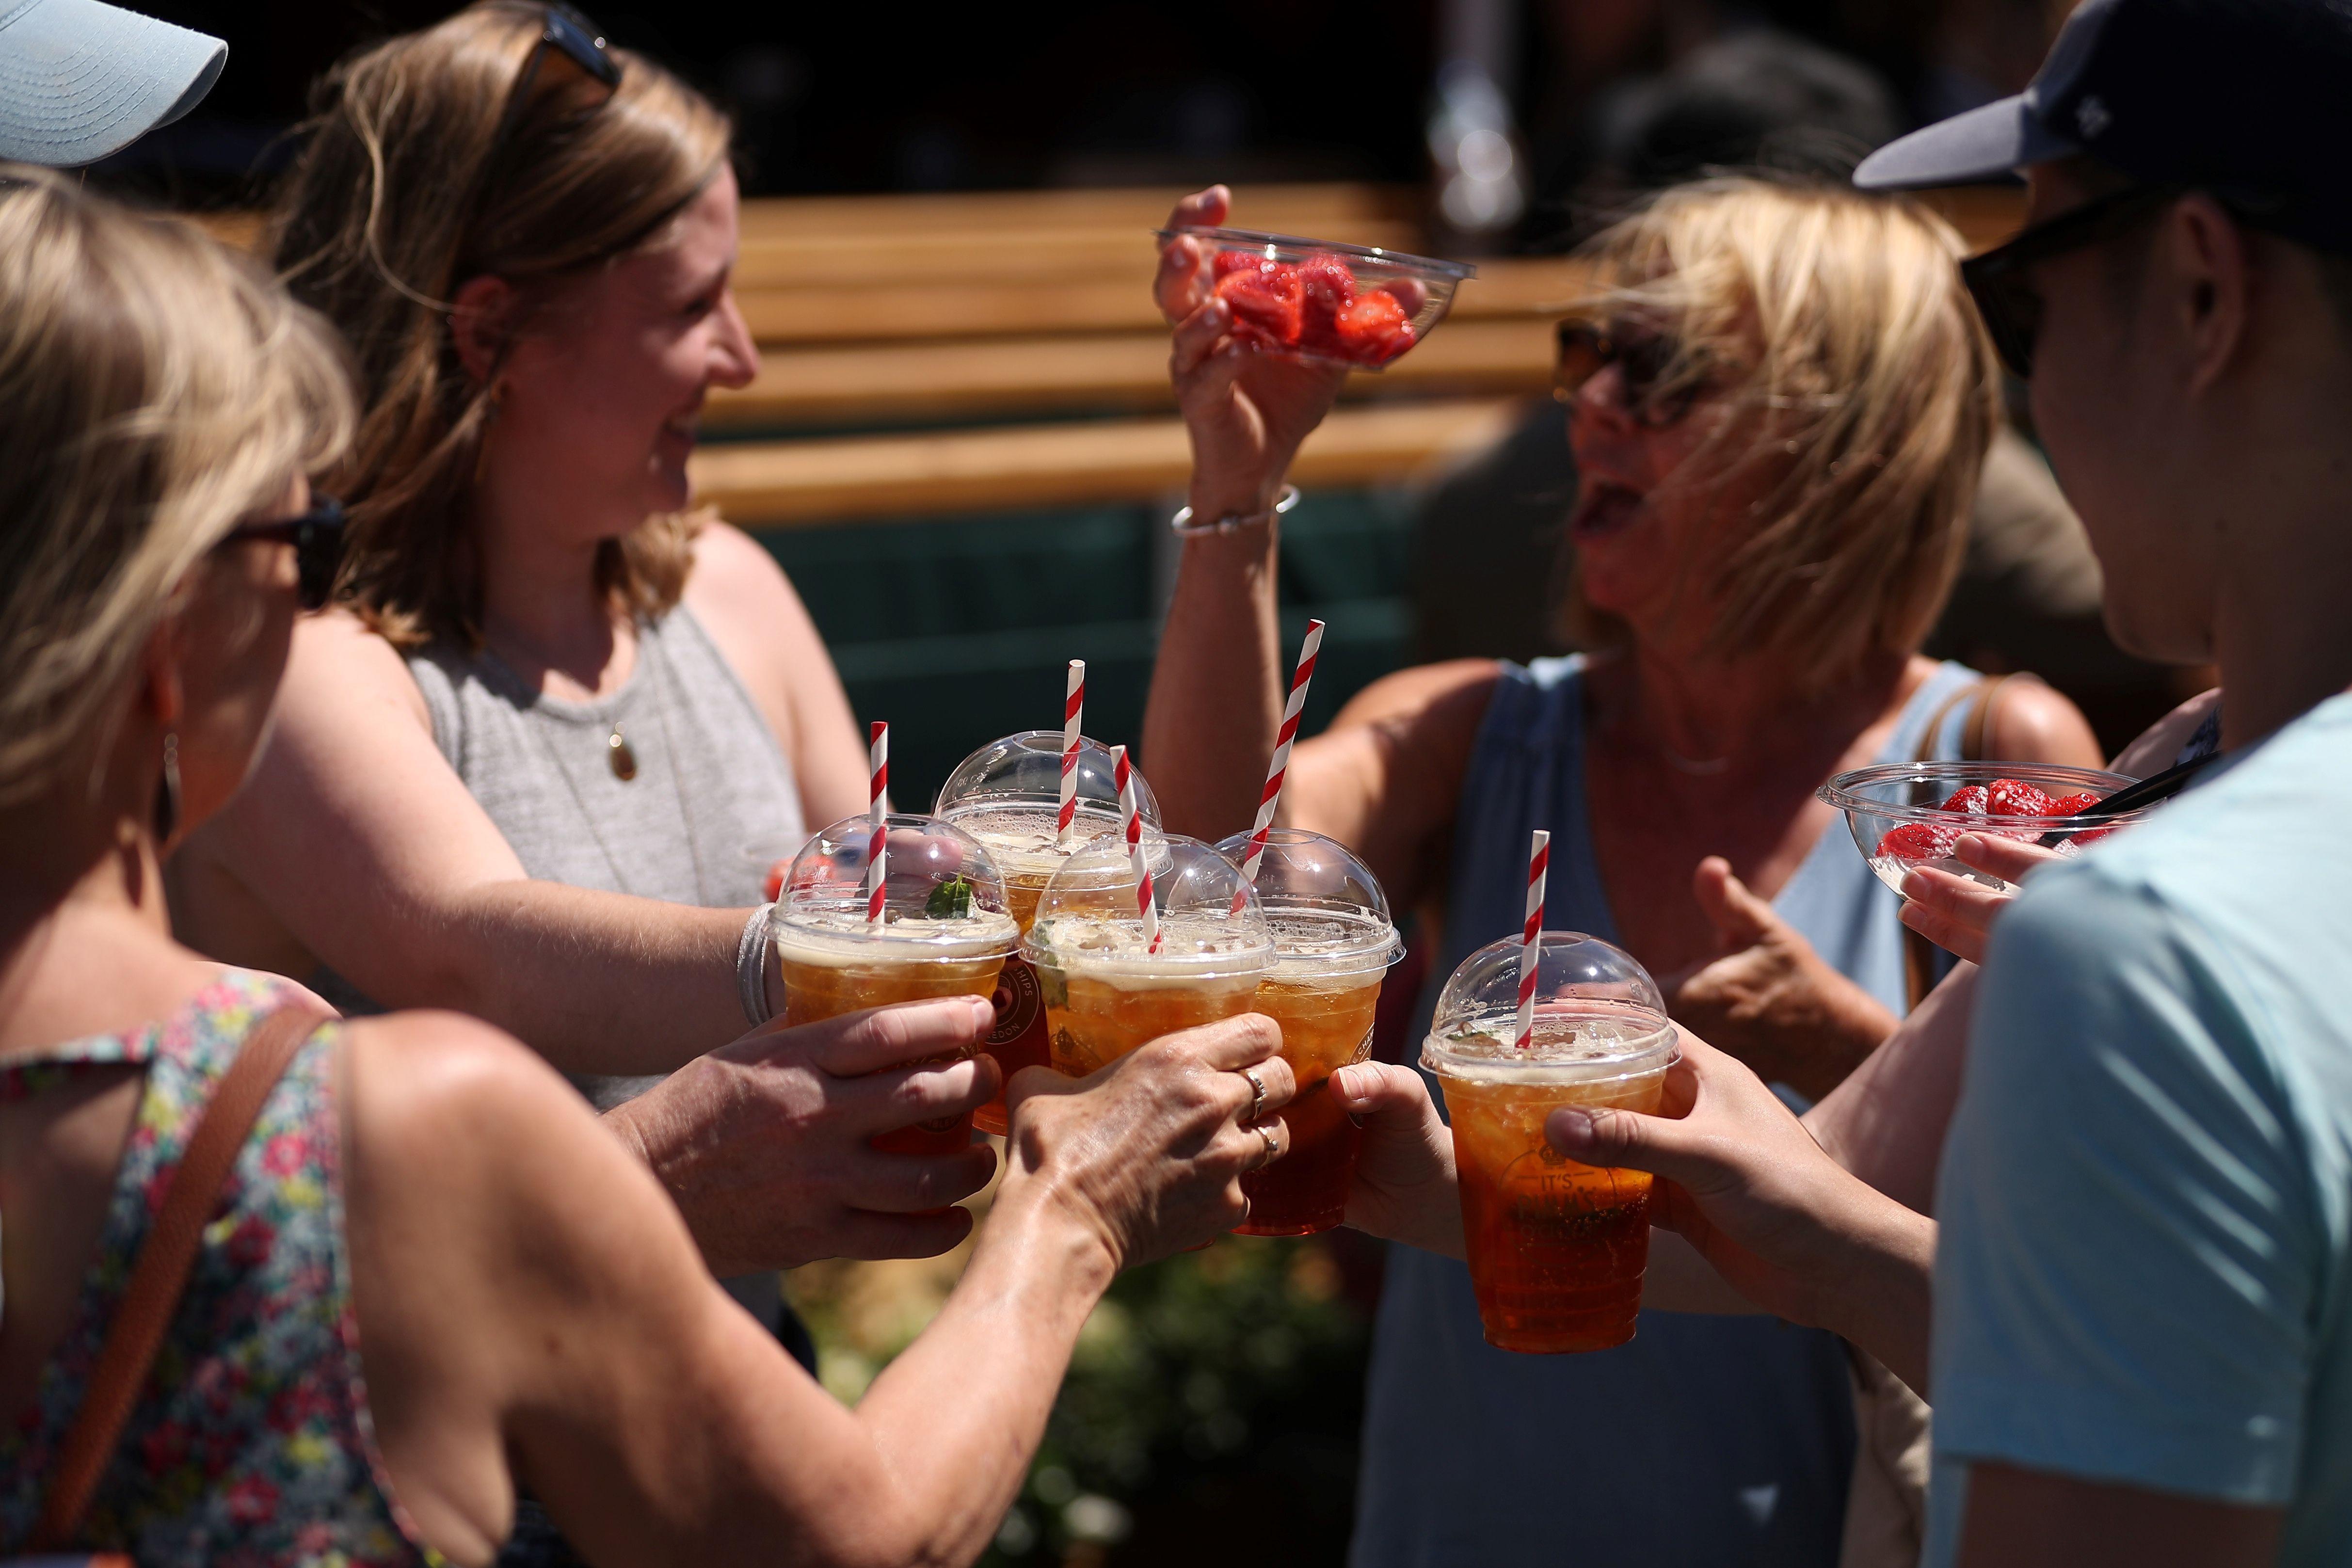 Wimbledon is trying to prevent drunken behaviour among fans